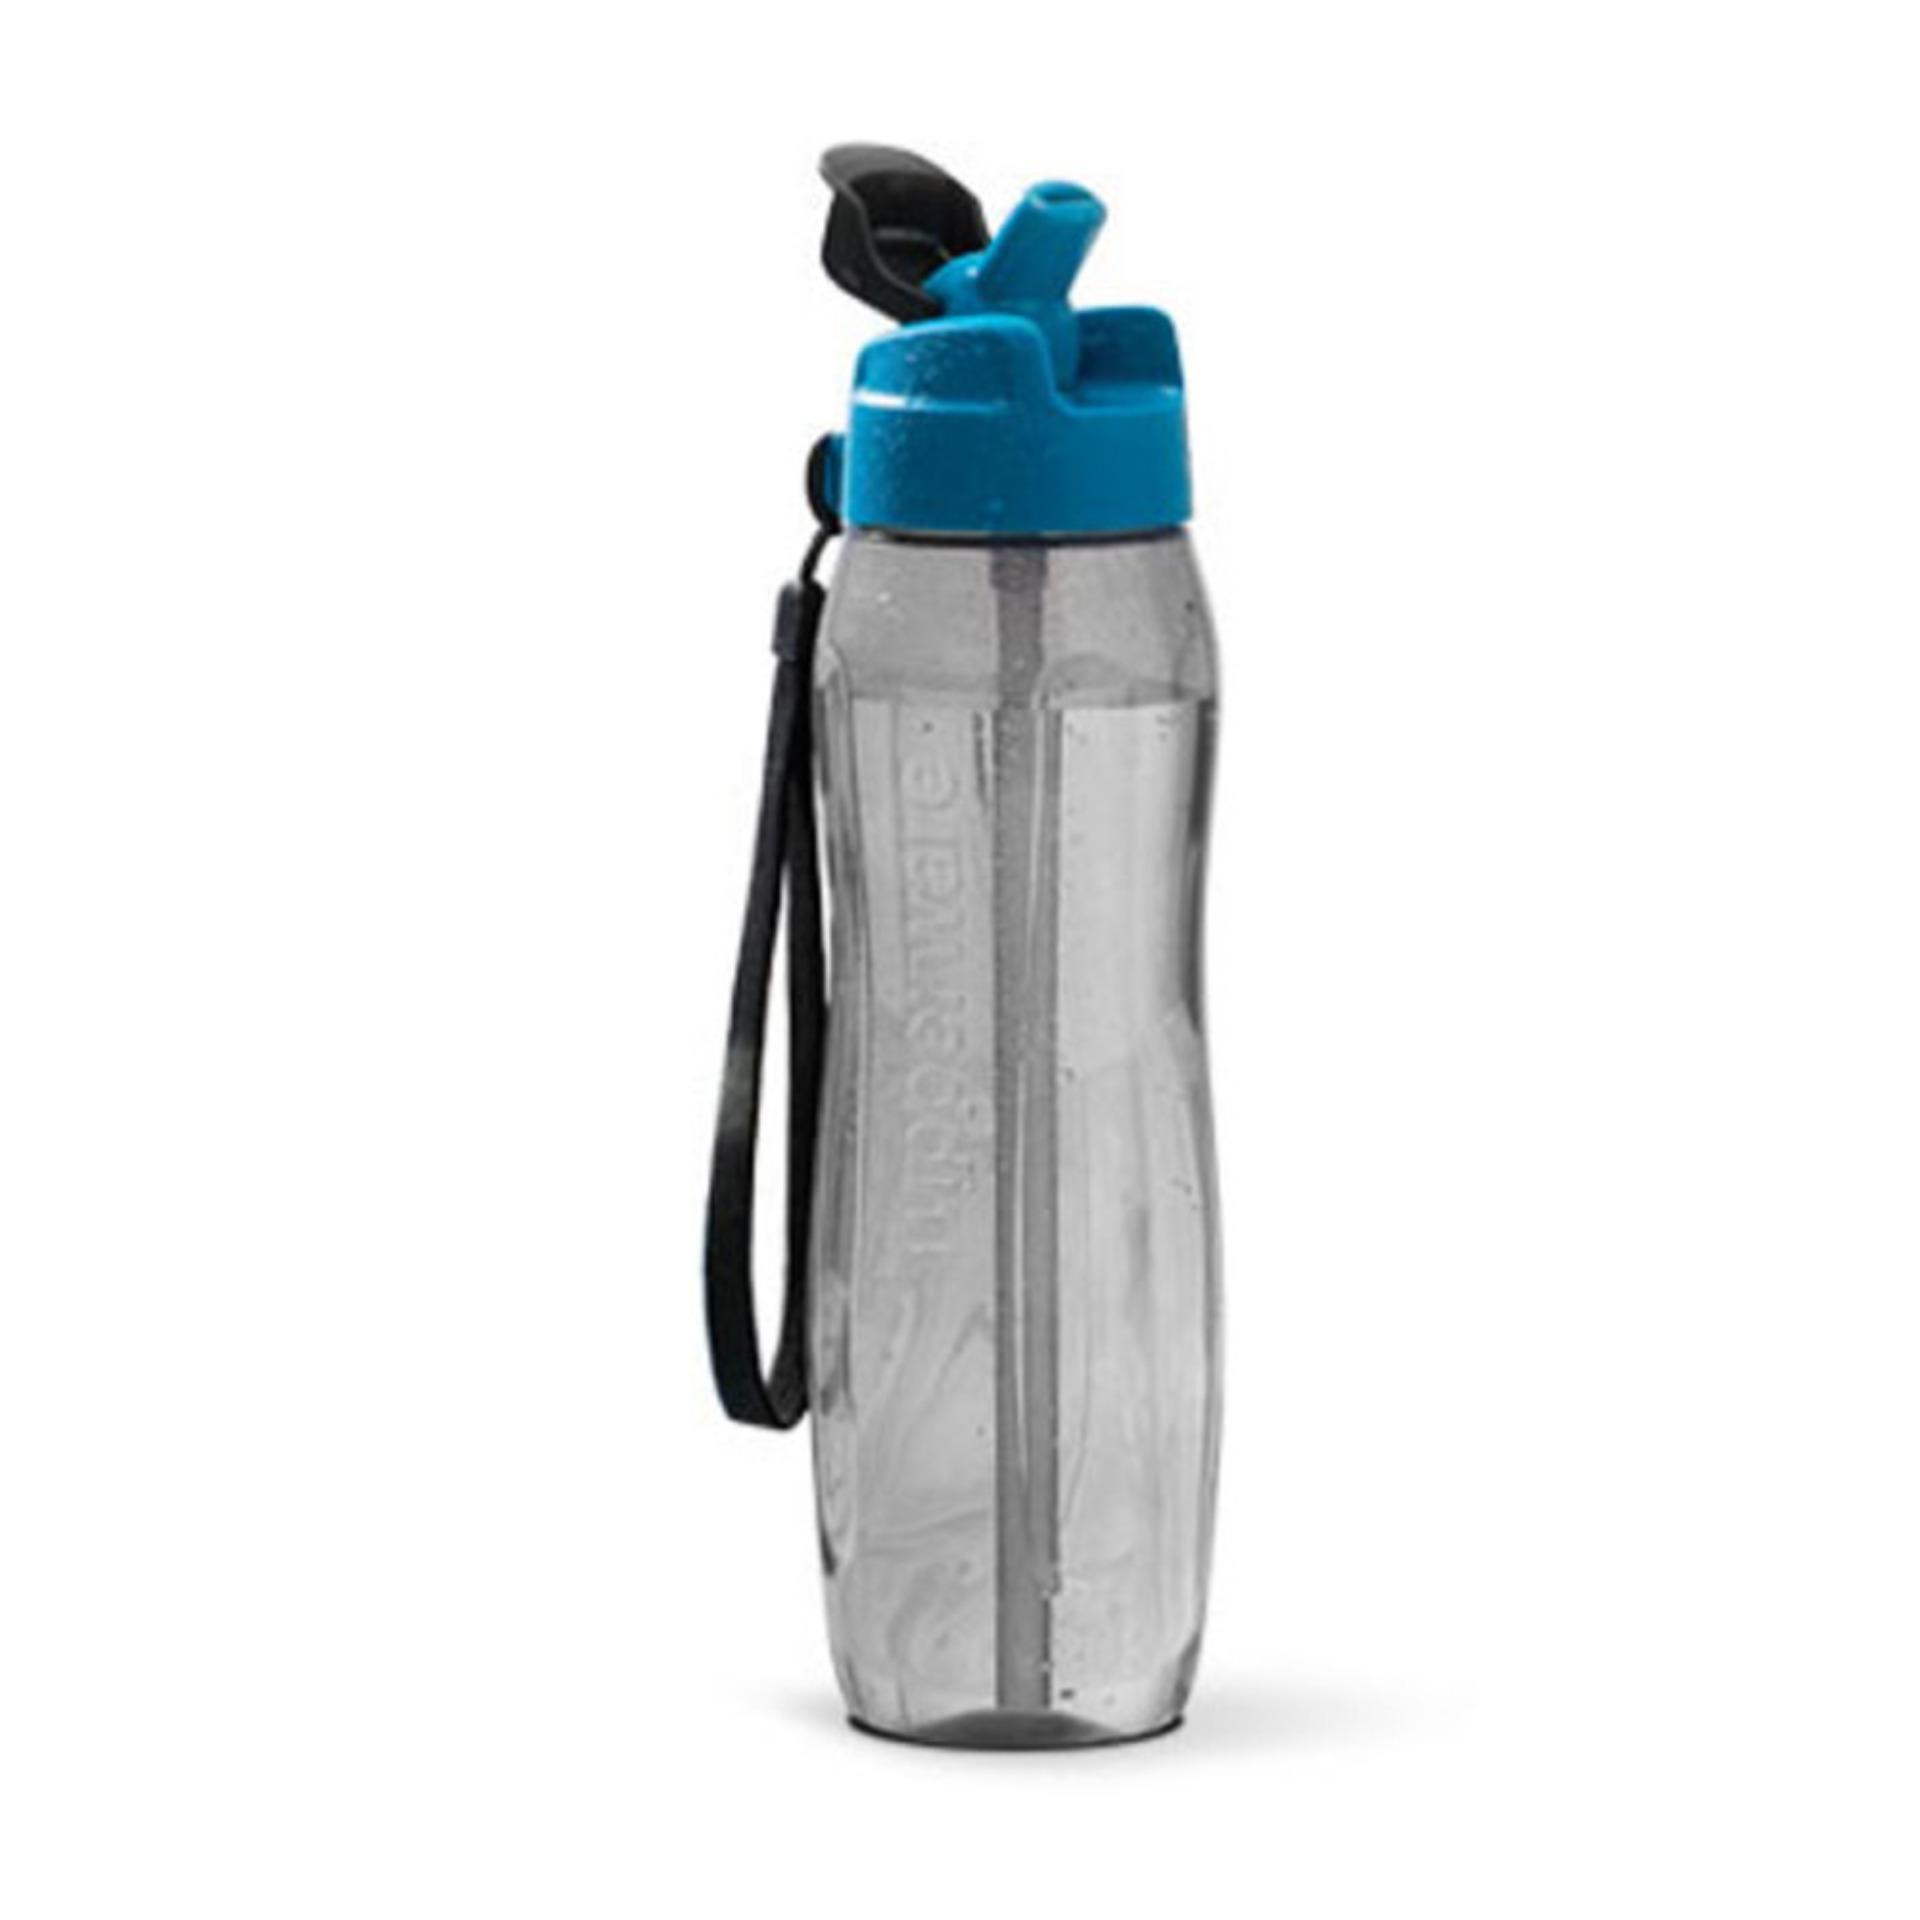 Botol Minum Tupperware Terlengkap Minuman Anak X Treme Bottle With Straw Tempat